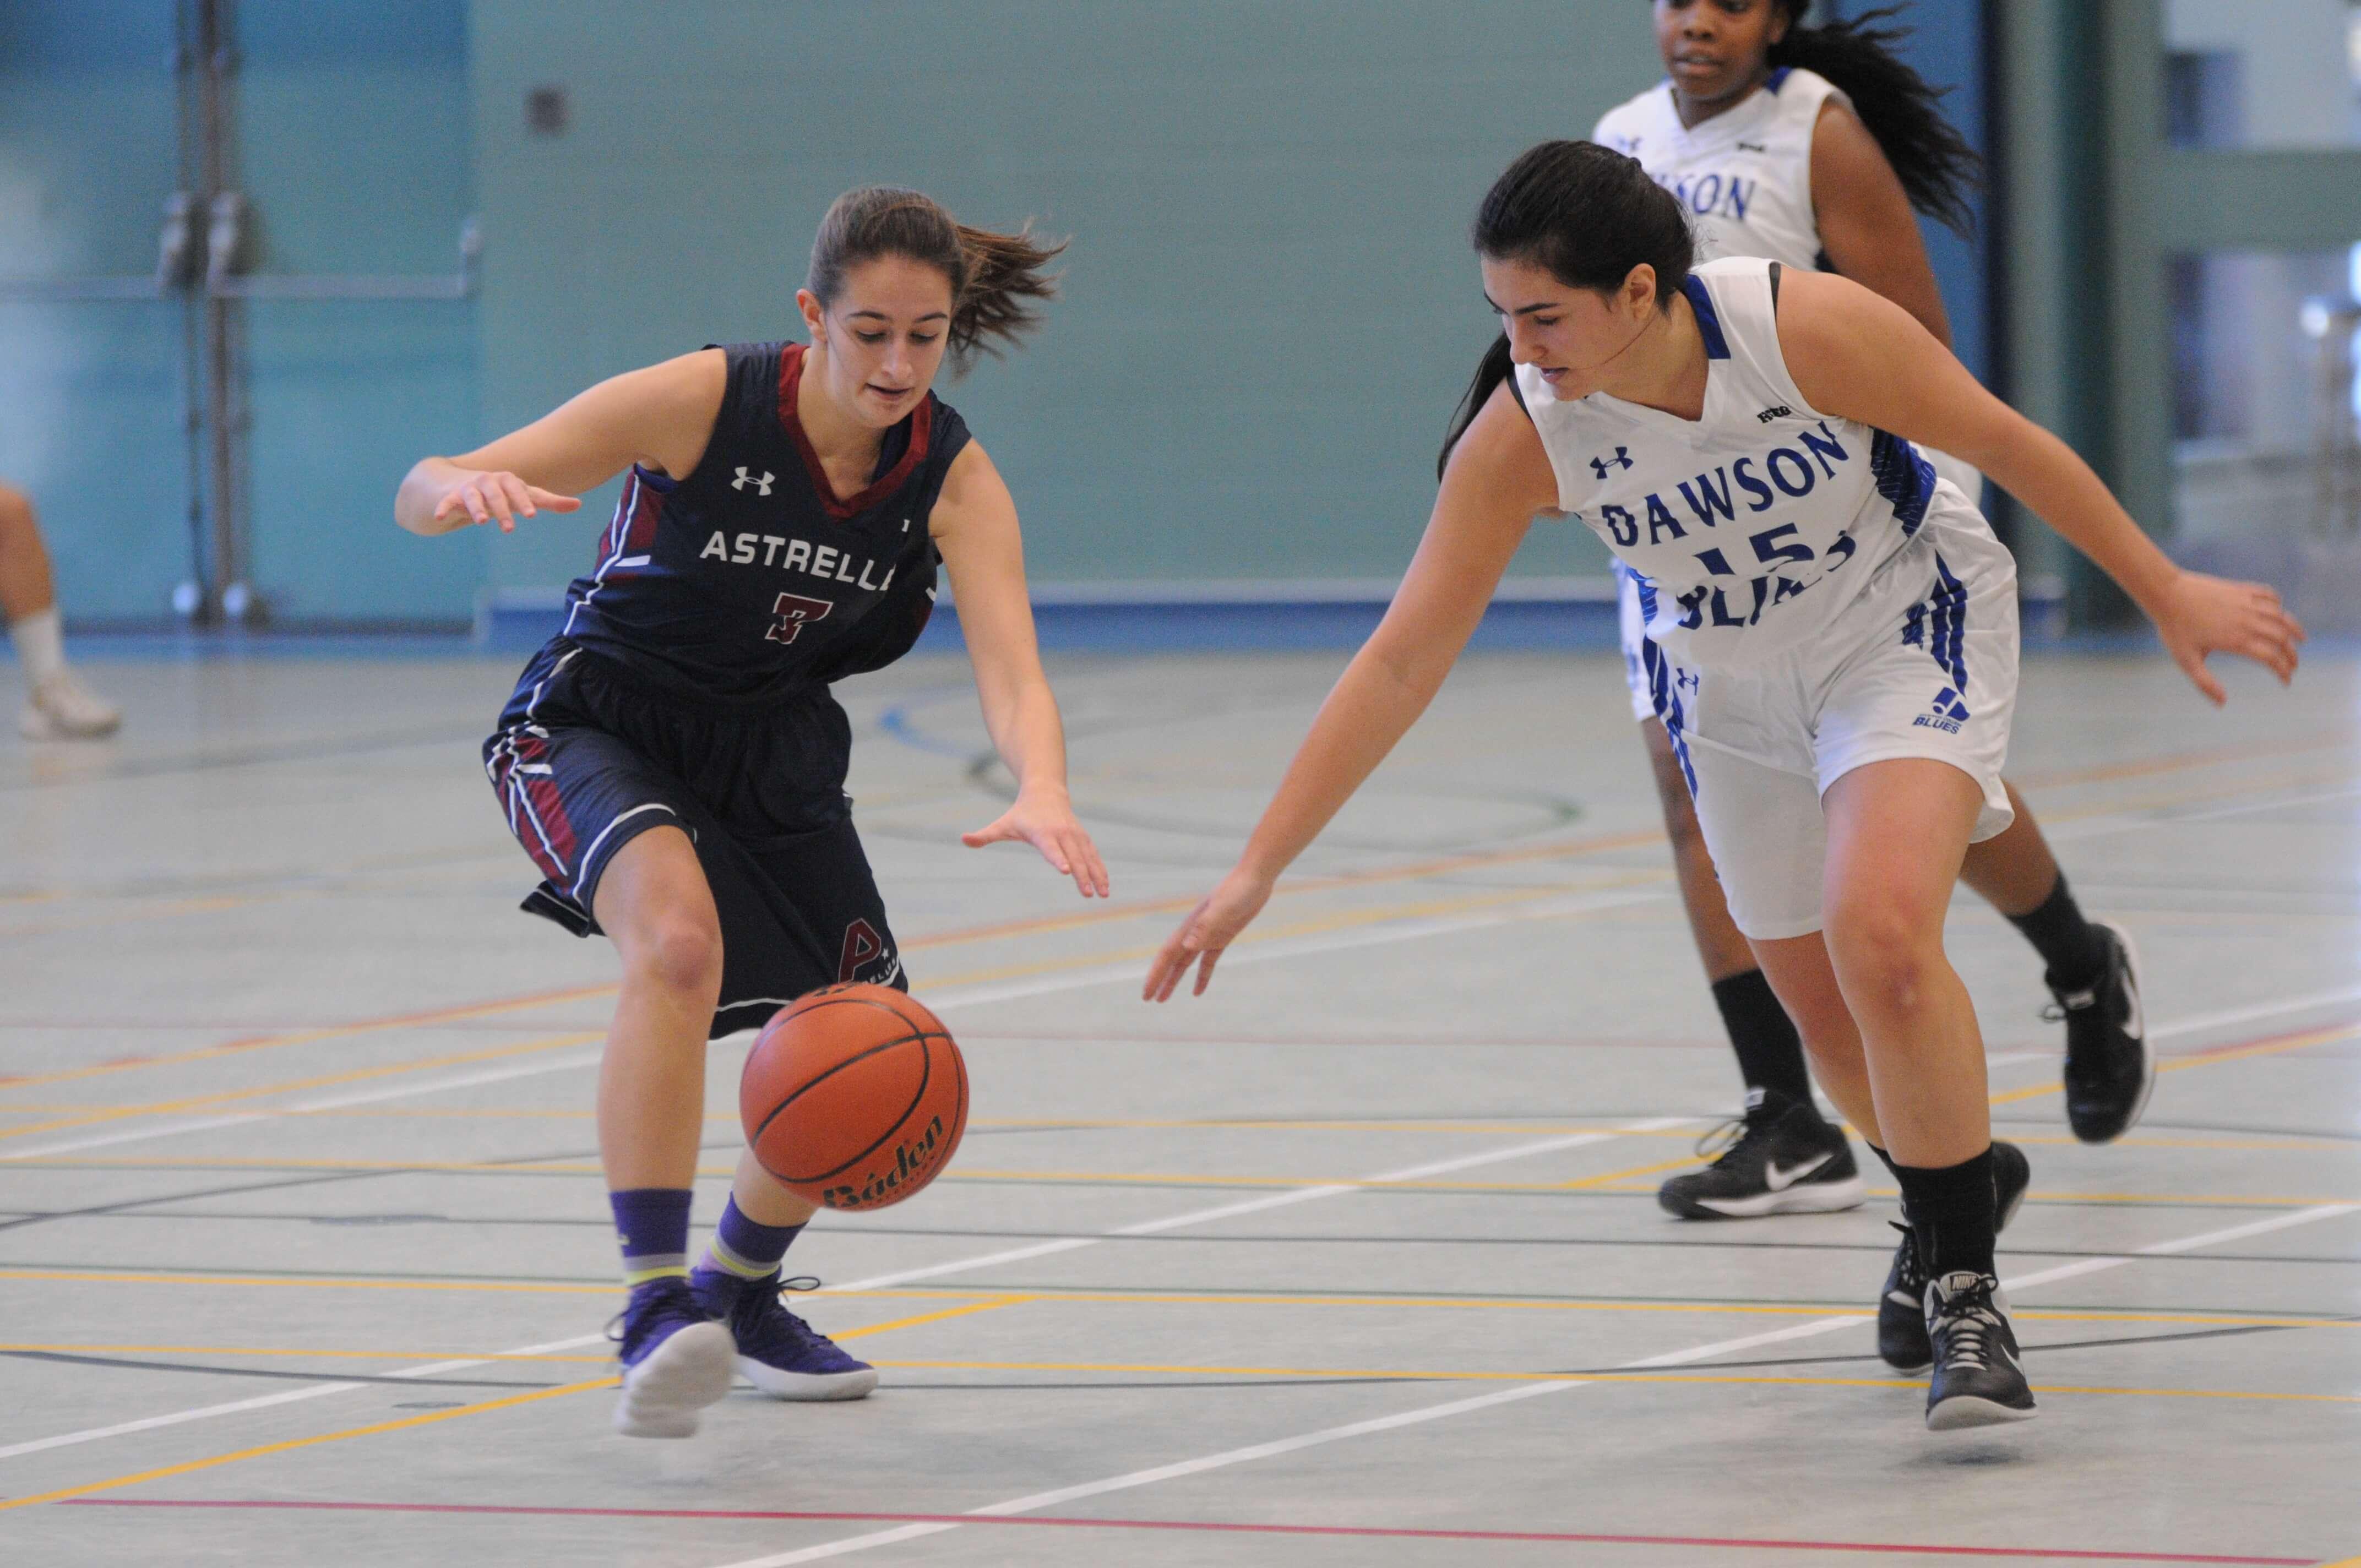 Astrelles basketball